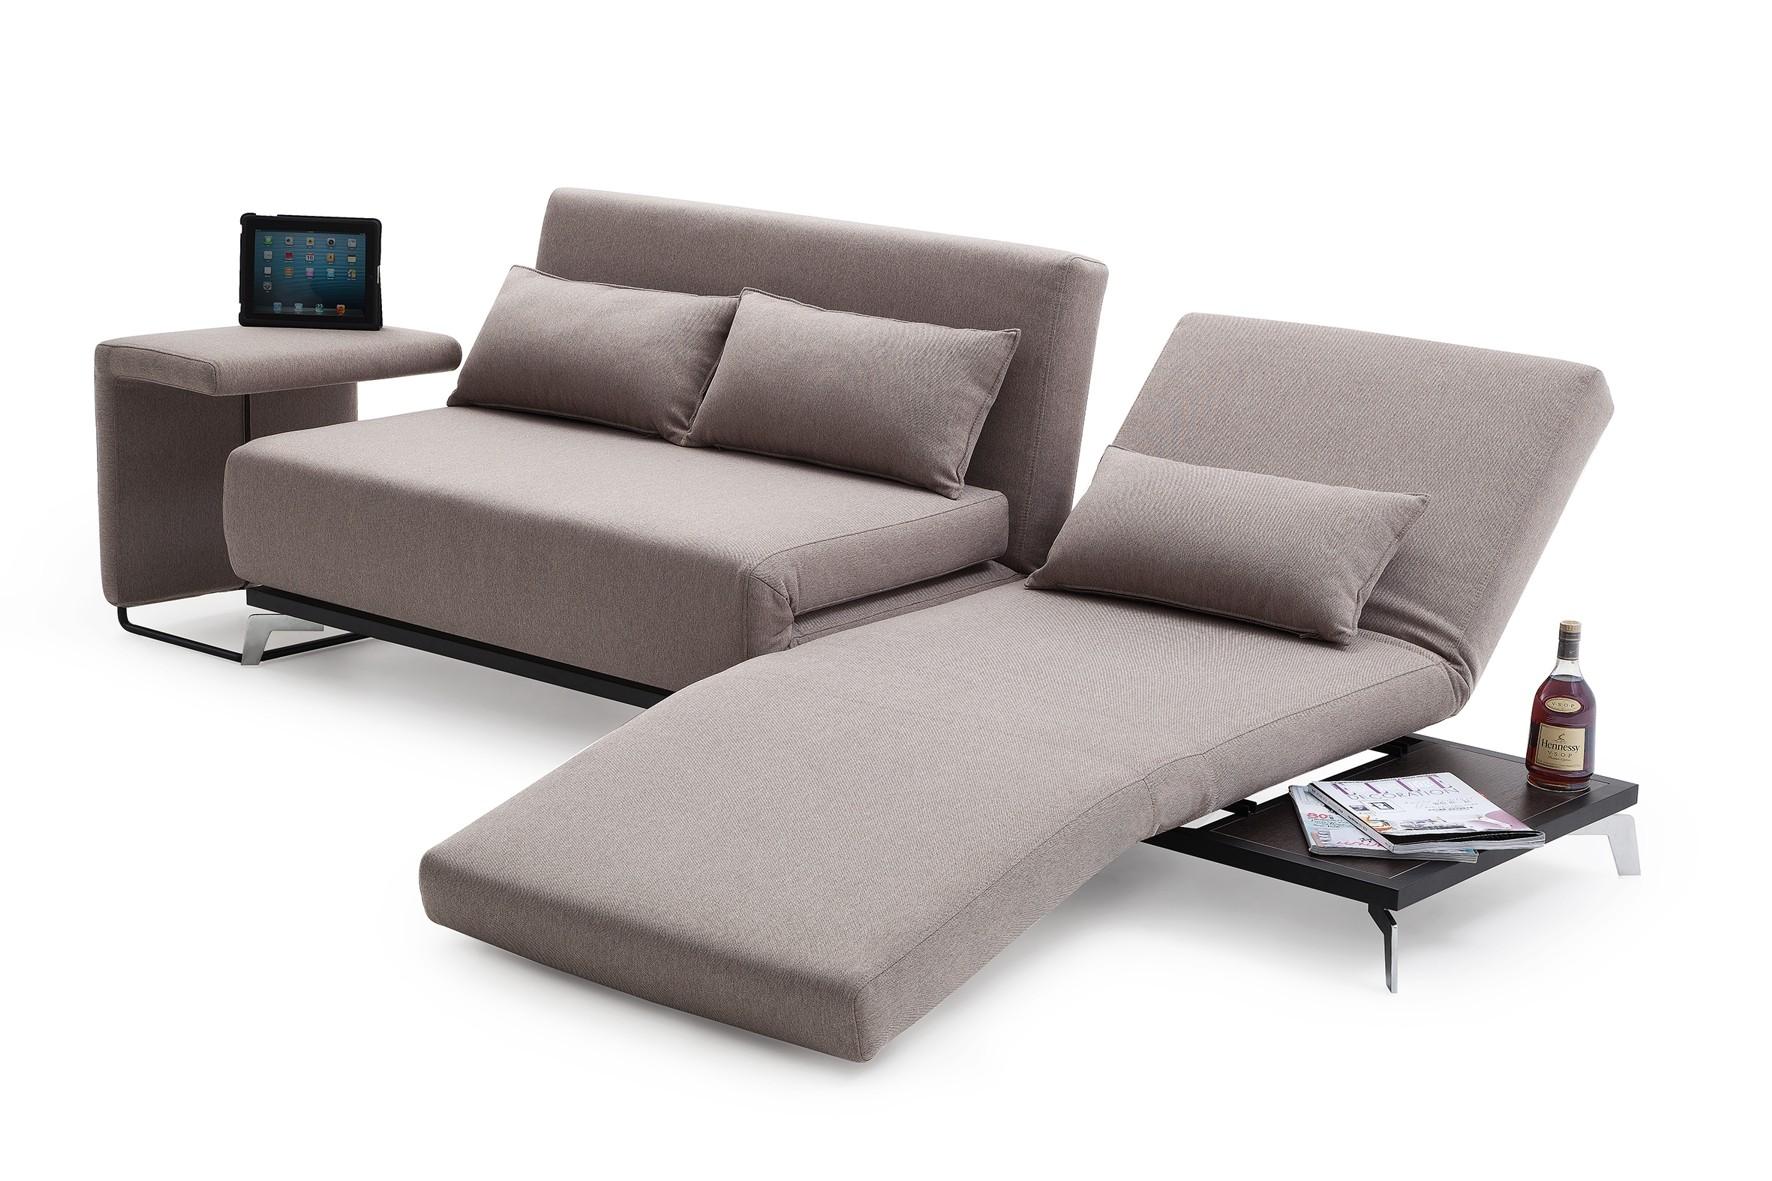 single sleeper chair homesfeed